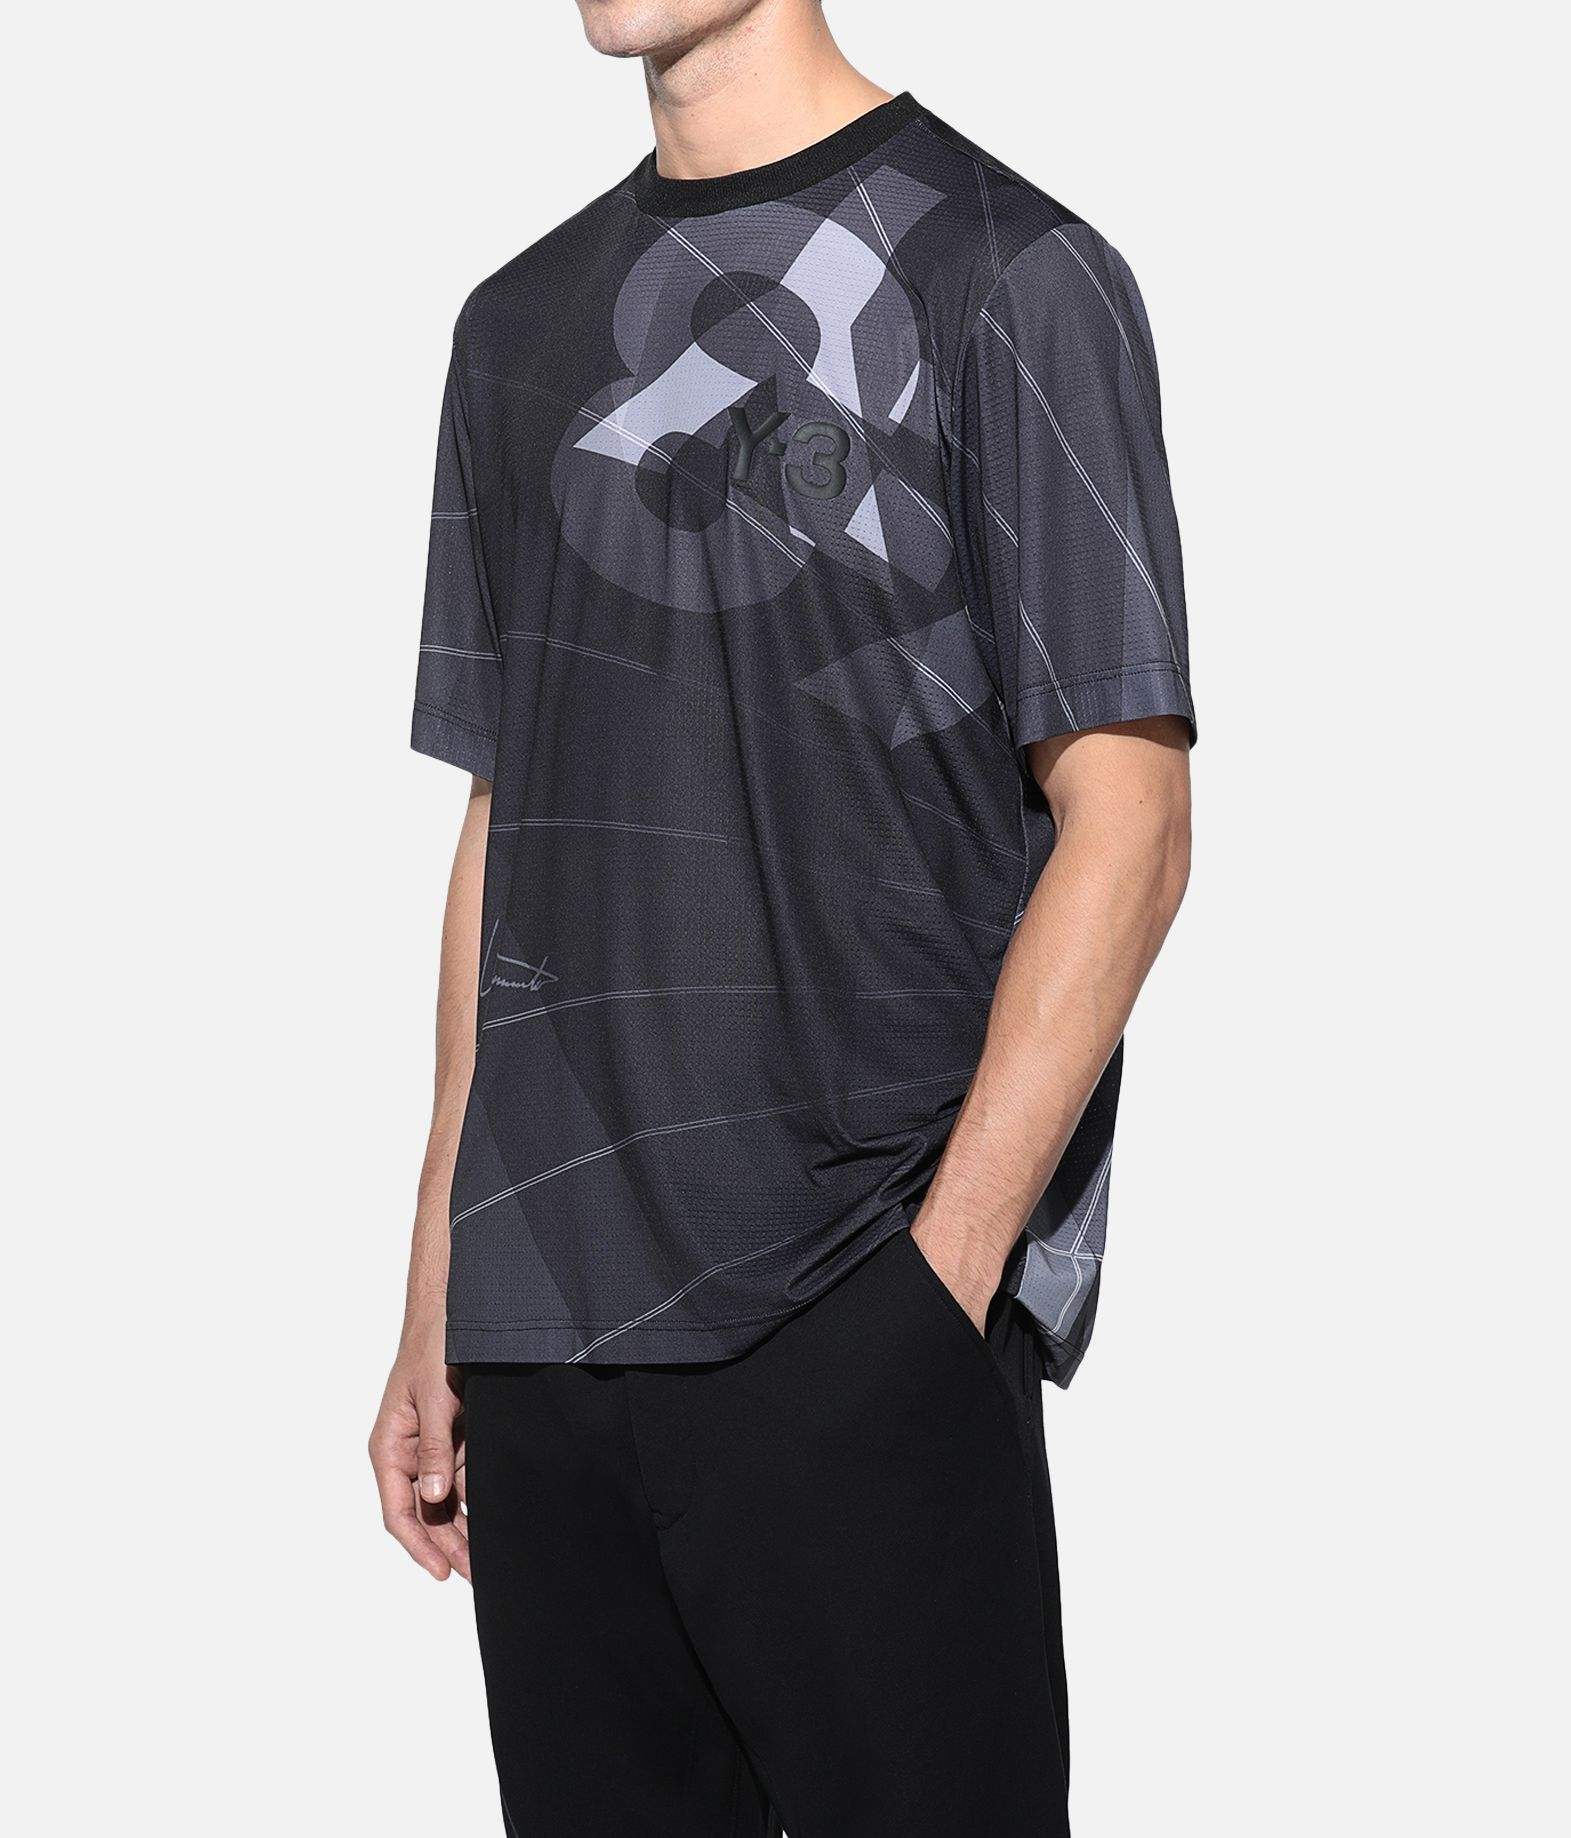 Y-3 Y-3 AOP Football Shirt Kurzärmliges T-shirt Herren e